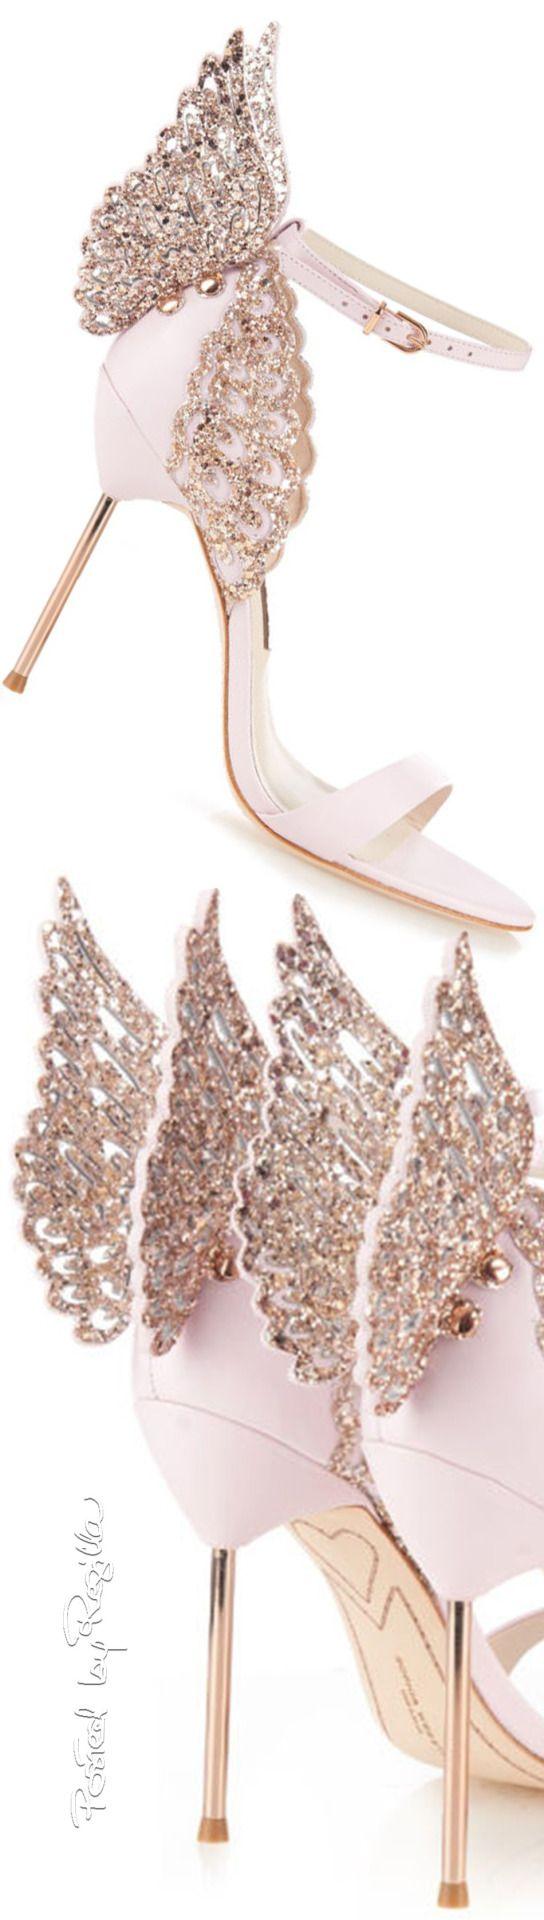 Regilla ⚜ Sophia Webster For latest fashion clothes visit us @ http://www.zoeslifestylefashion.com/clothing/